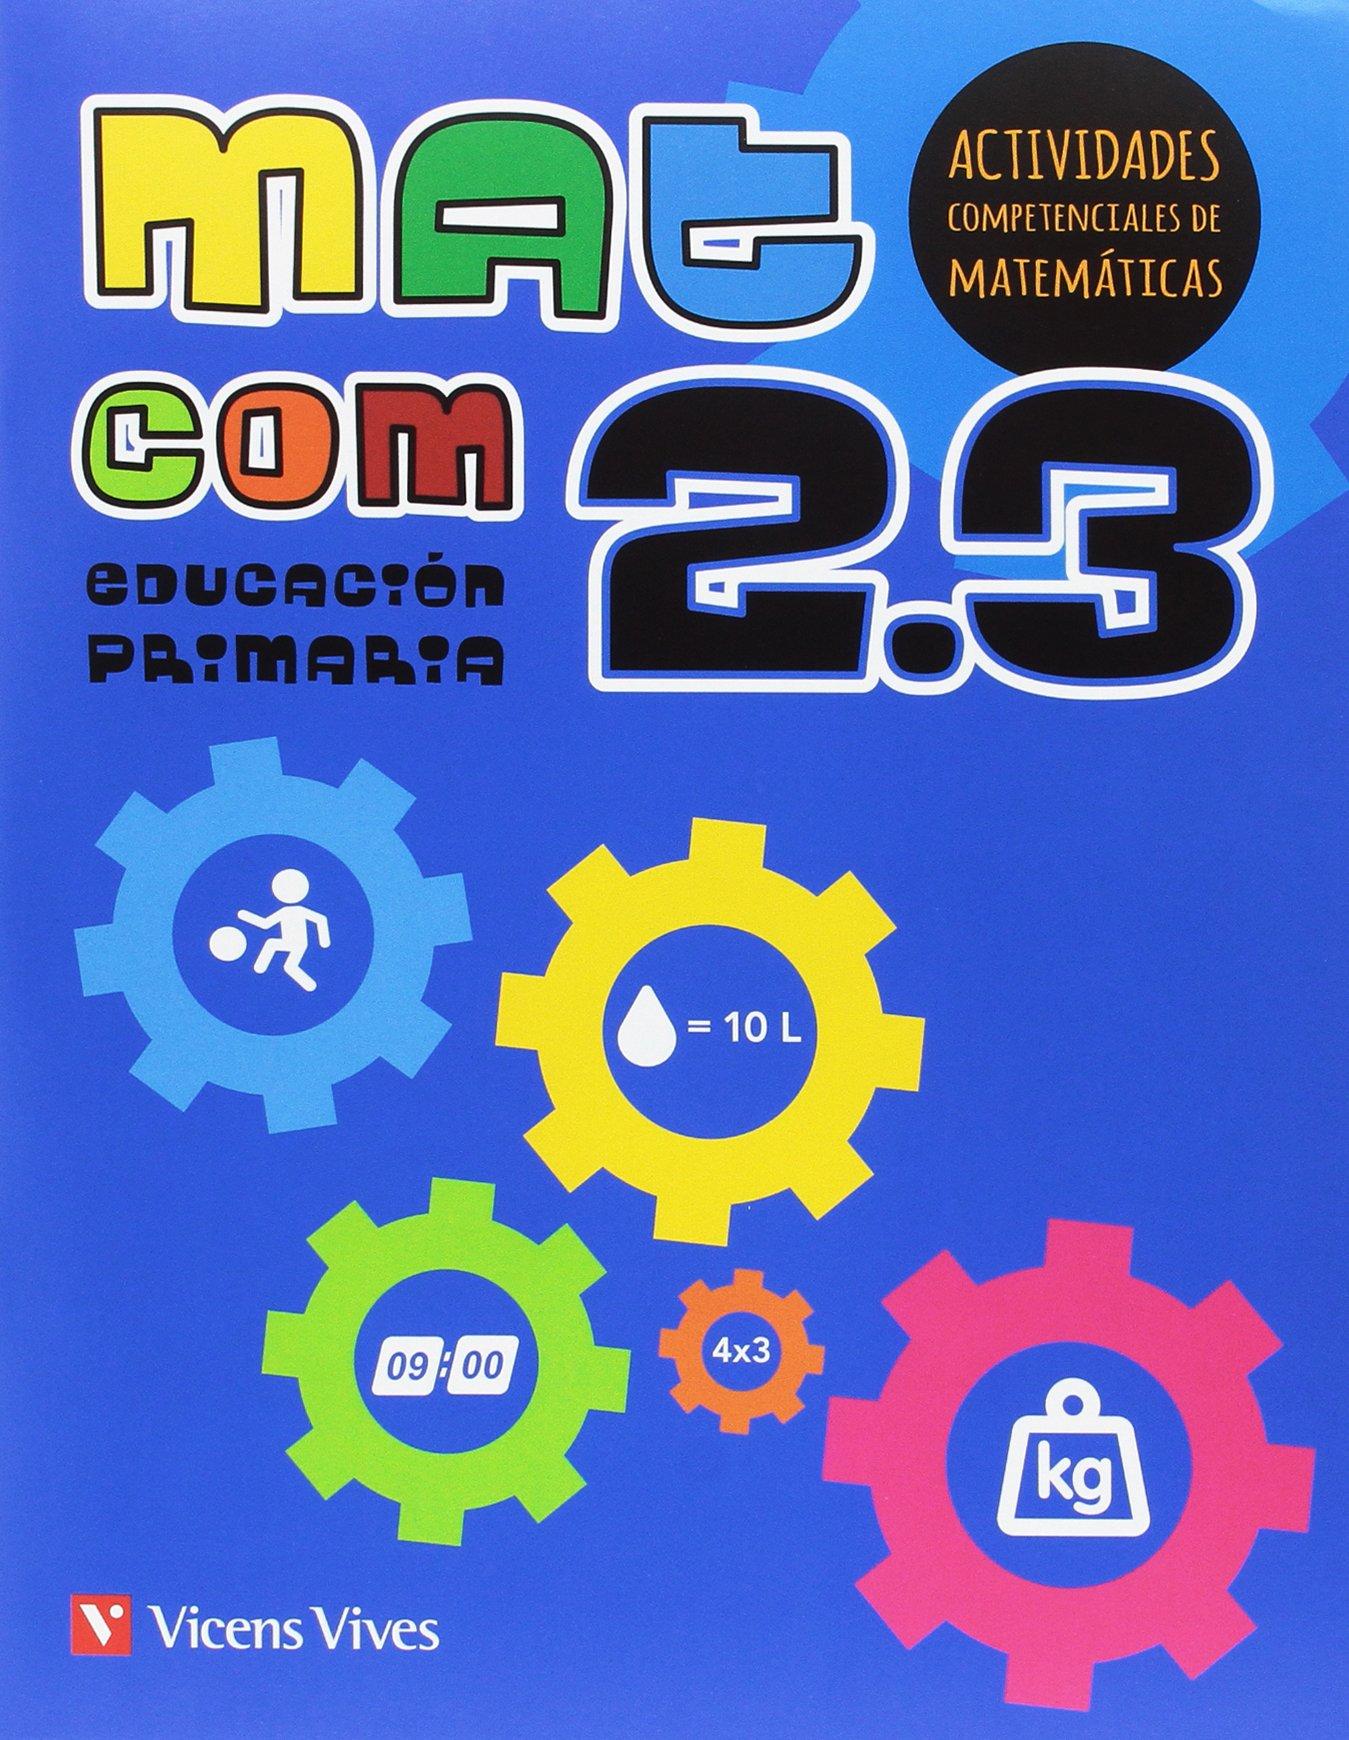 MAT COM 2 (2.1-2.2-2.3) ACTIVIDADES COMPETENCIALES (Spanish) Paperback – April 2, 2014